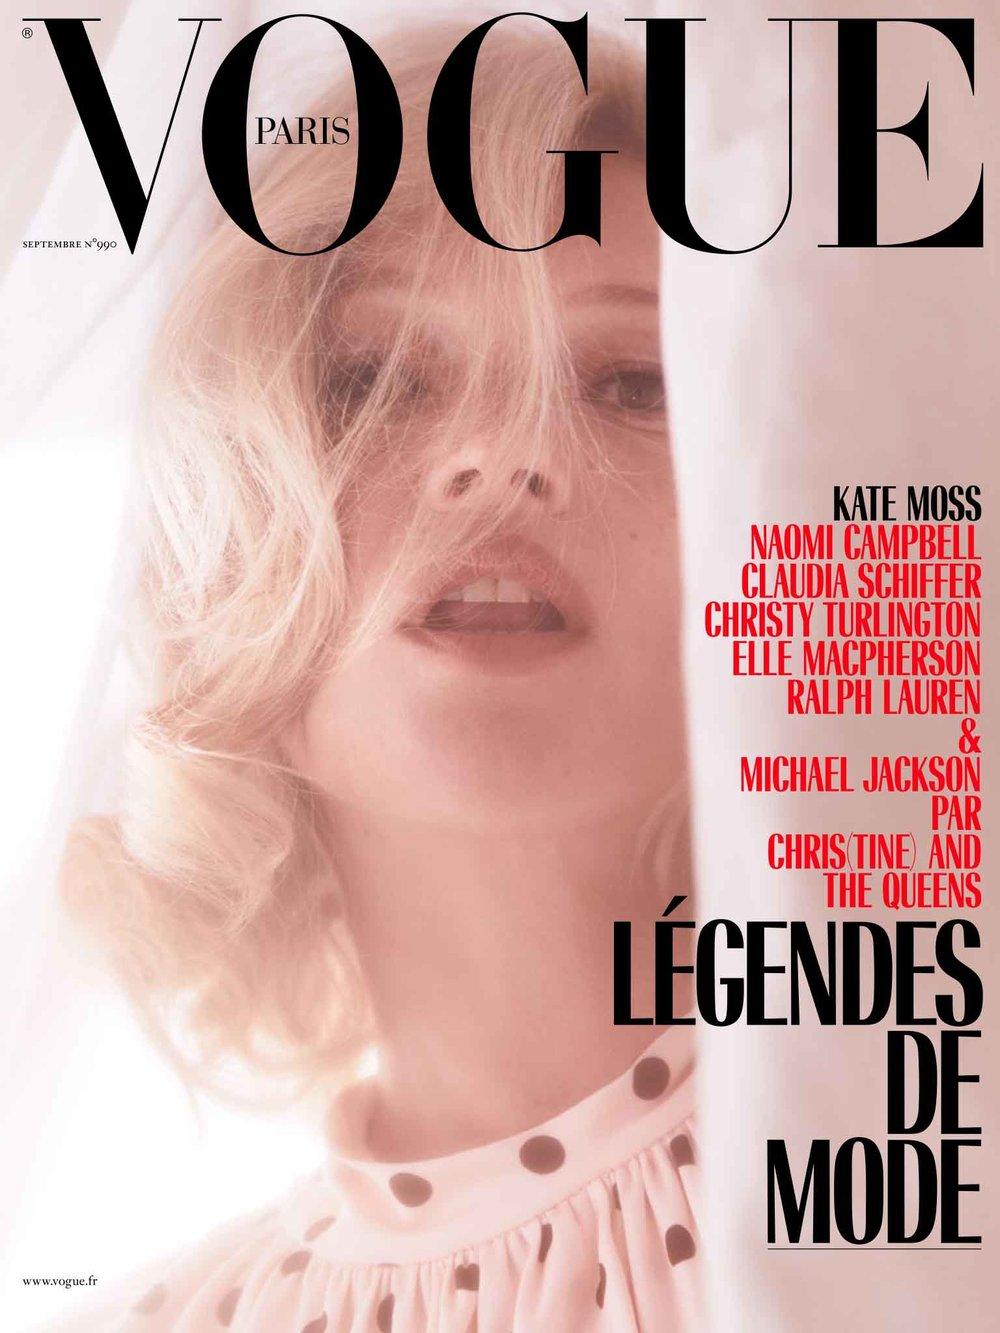 Vogue_france_paris_iacobella_missoni.jpg